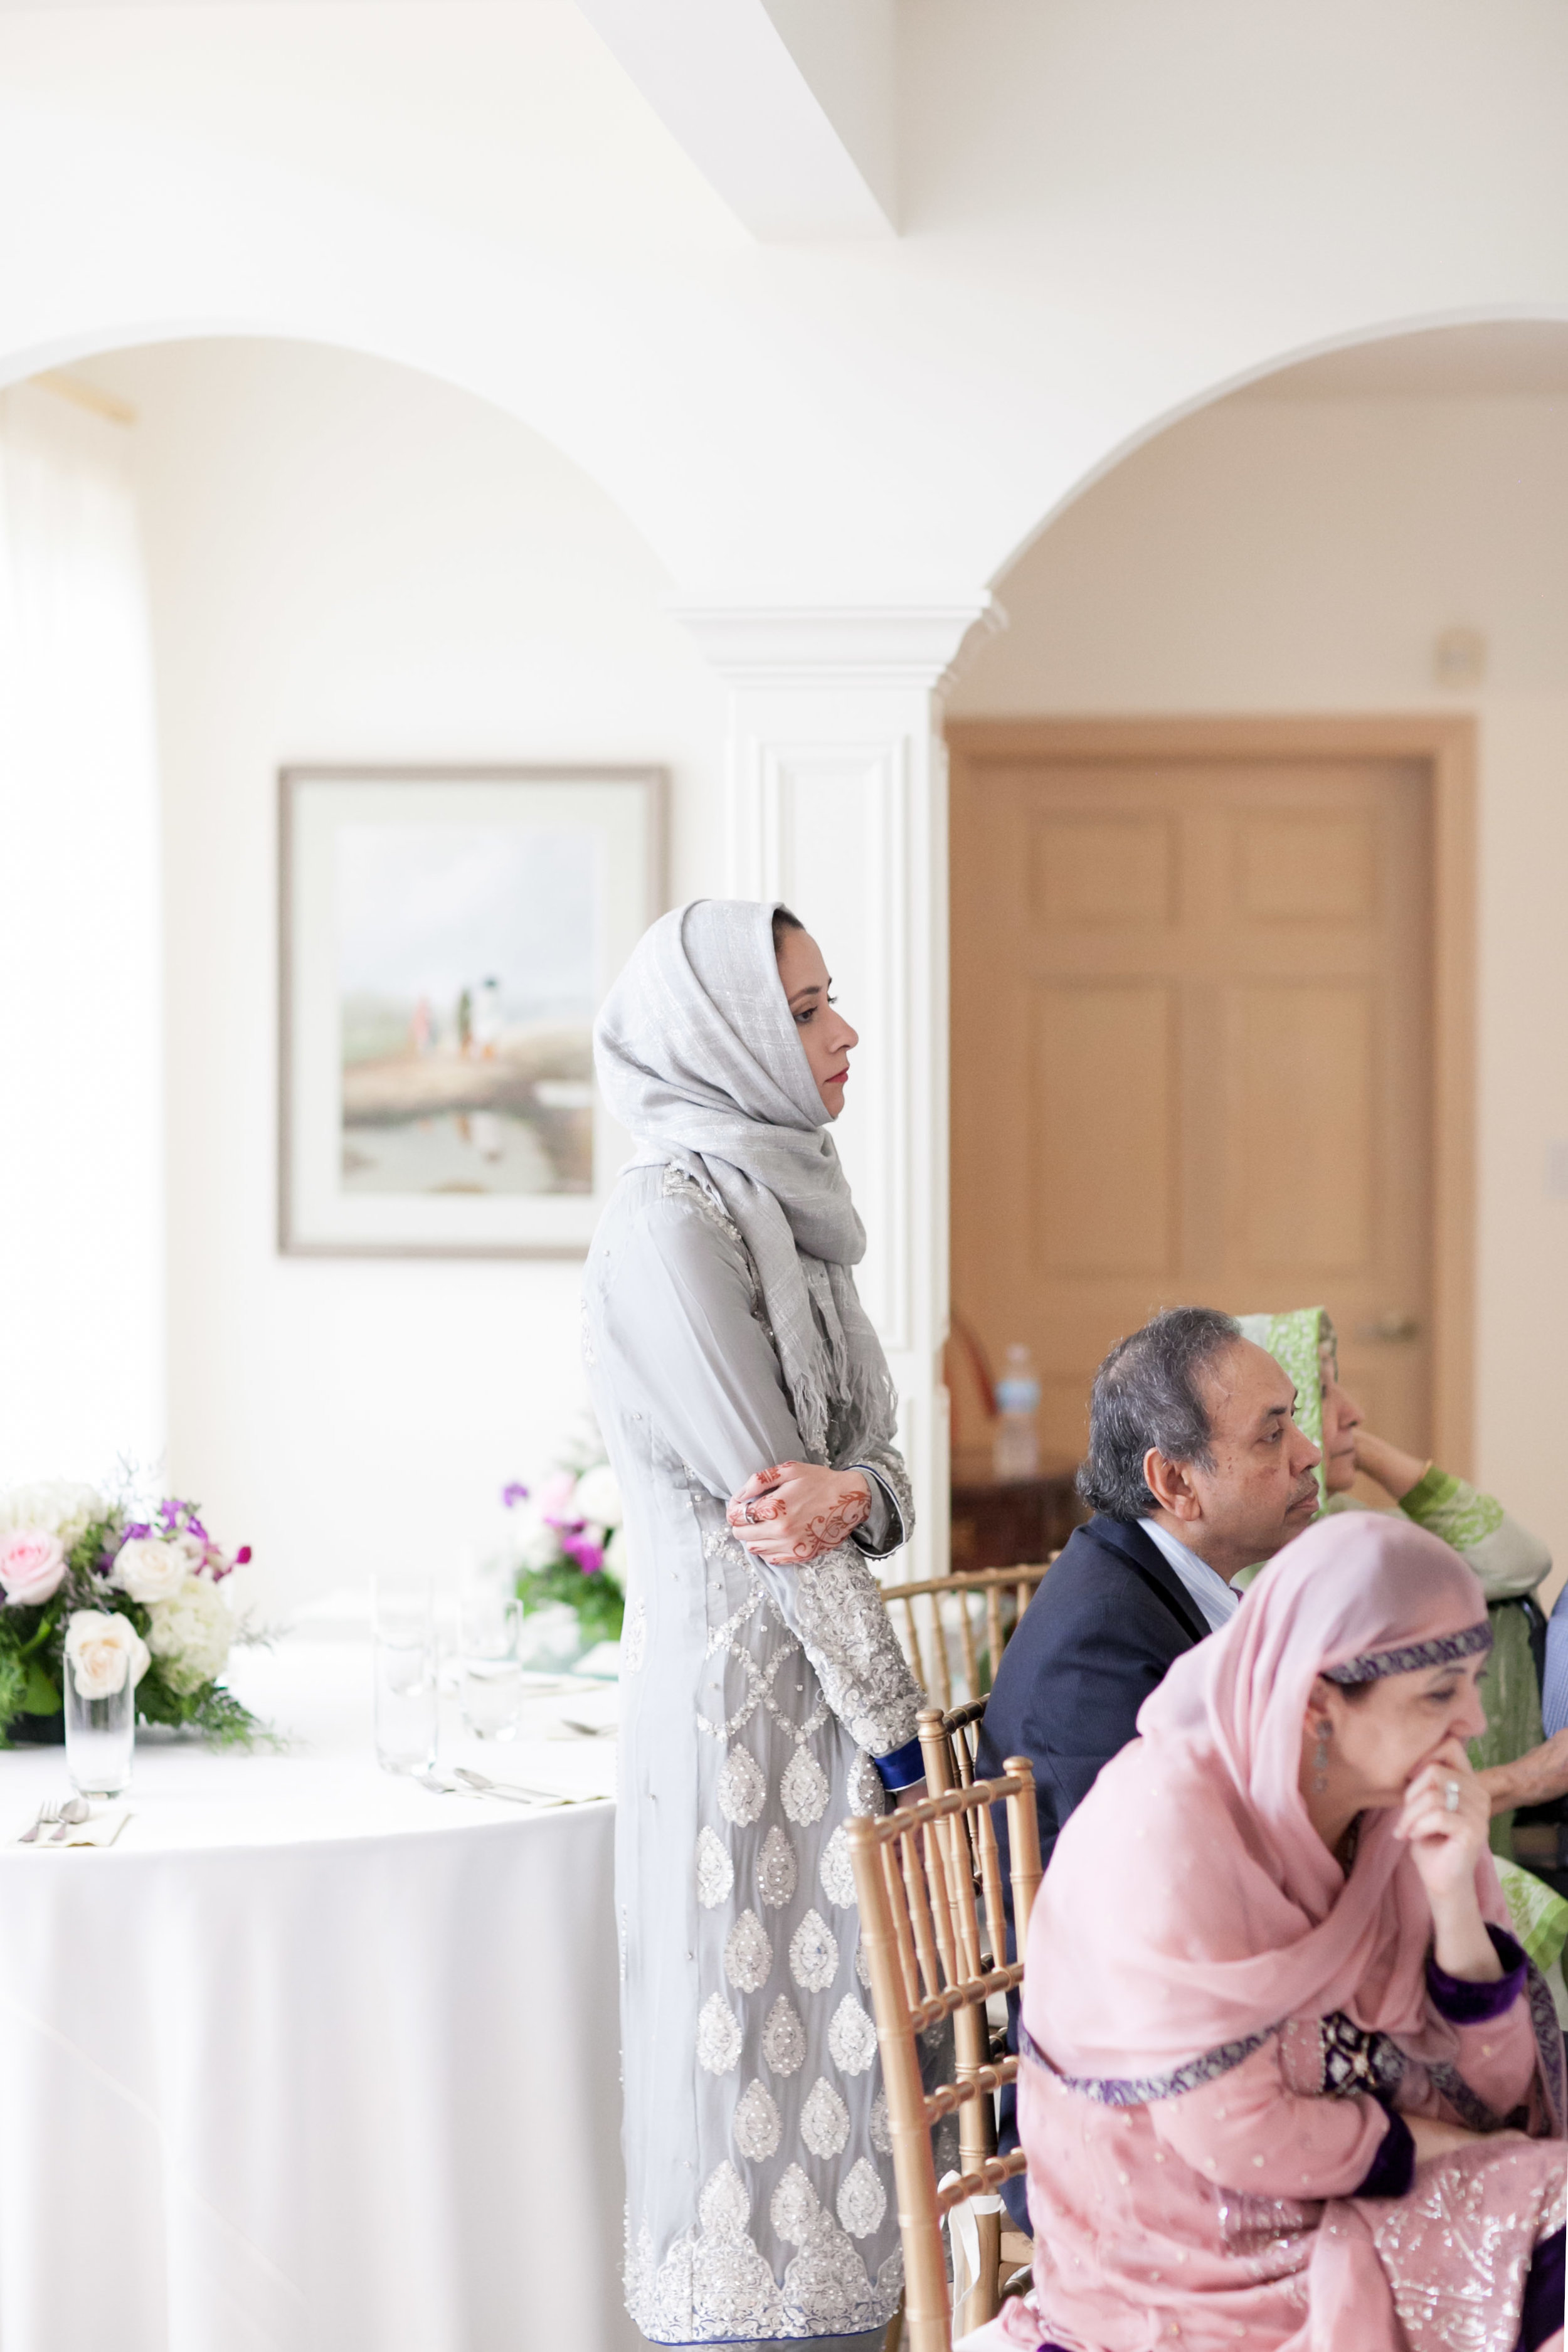 LisaDiederichPhotography_Maryam&Salman-49.jpg